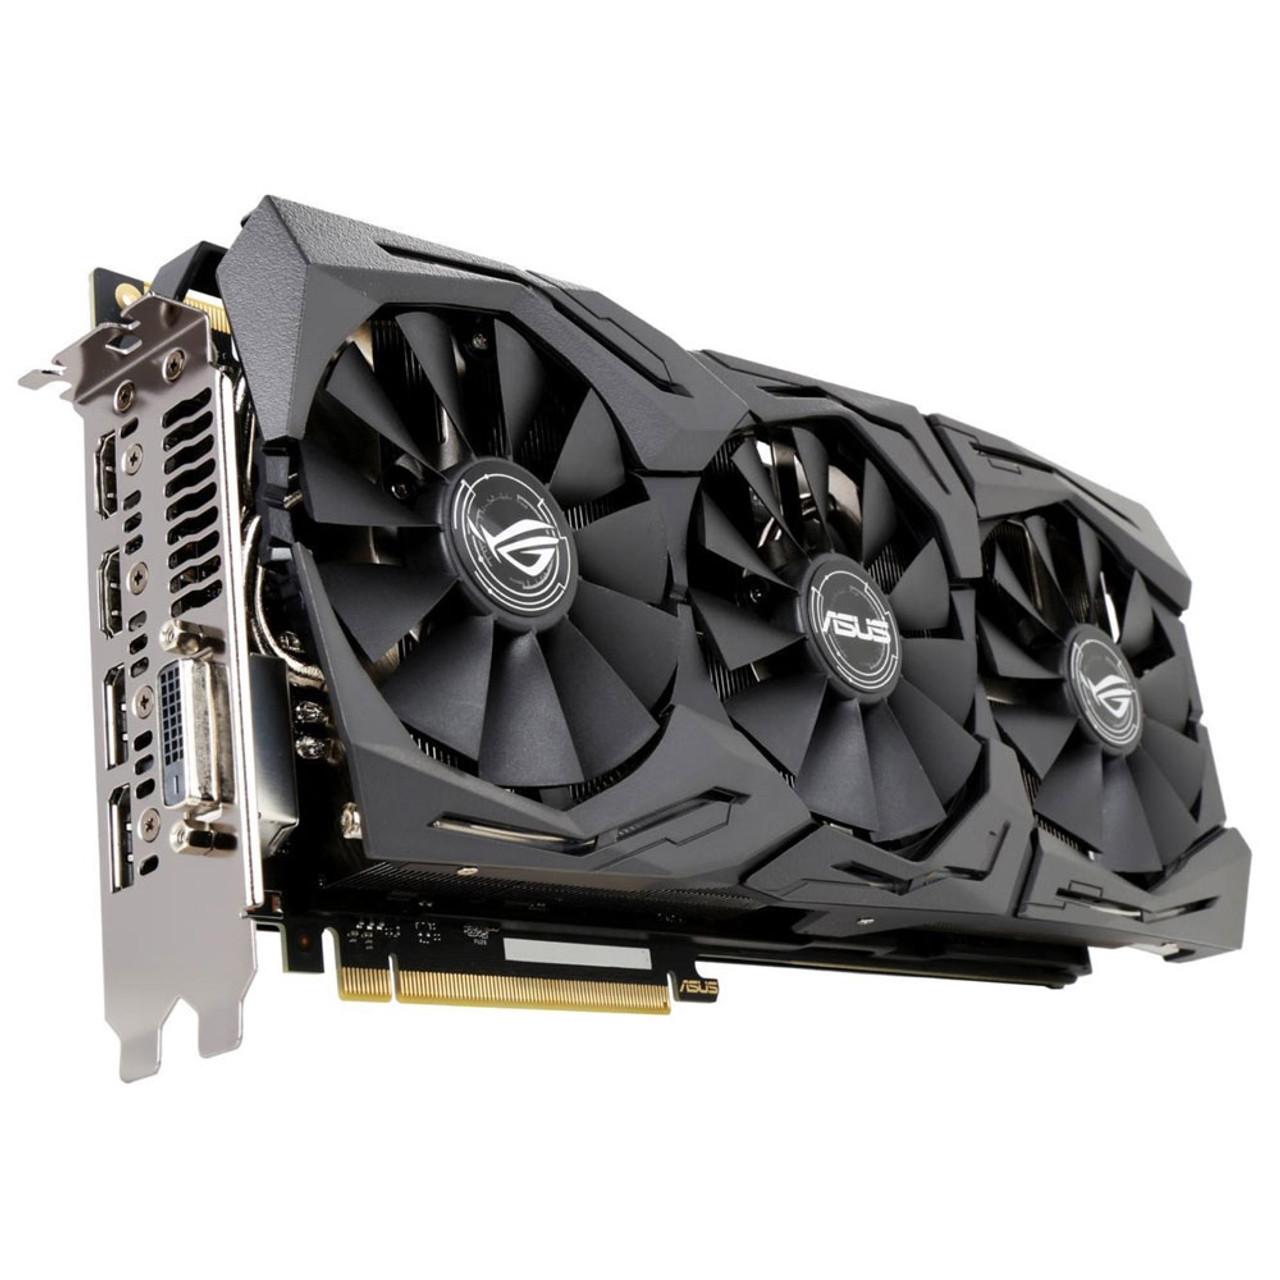 ASUS GeForce GTX 1080 Ti STRIX ROG Overclocked 11GB GDDR5X GAMING Video Card